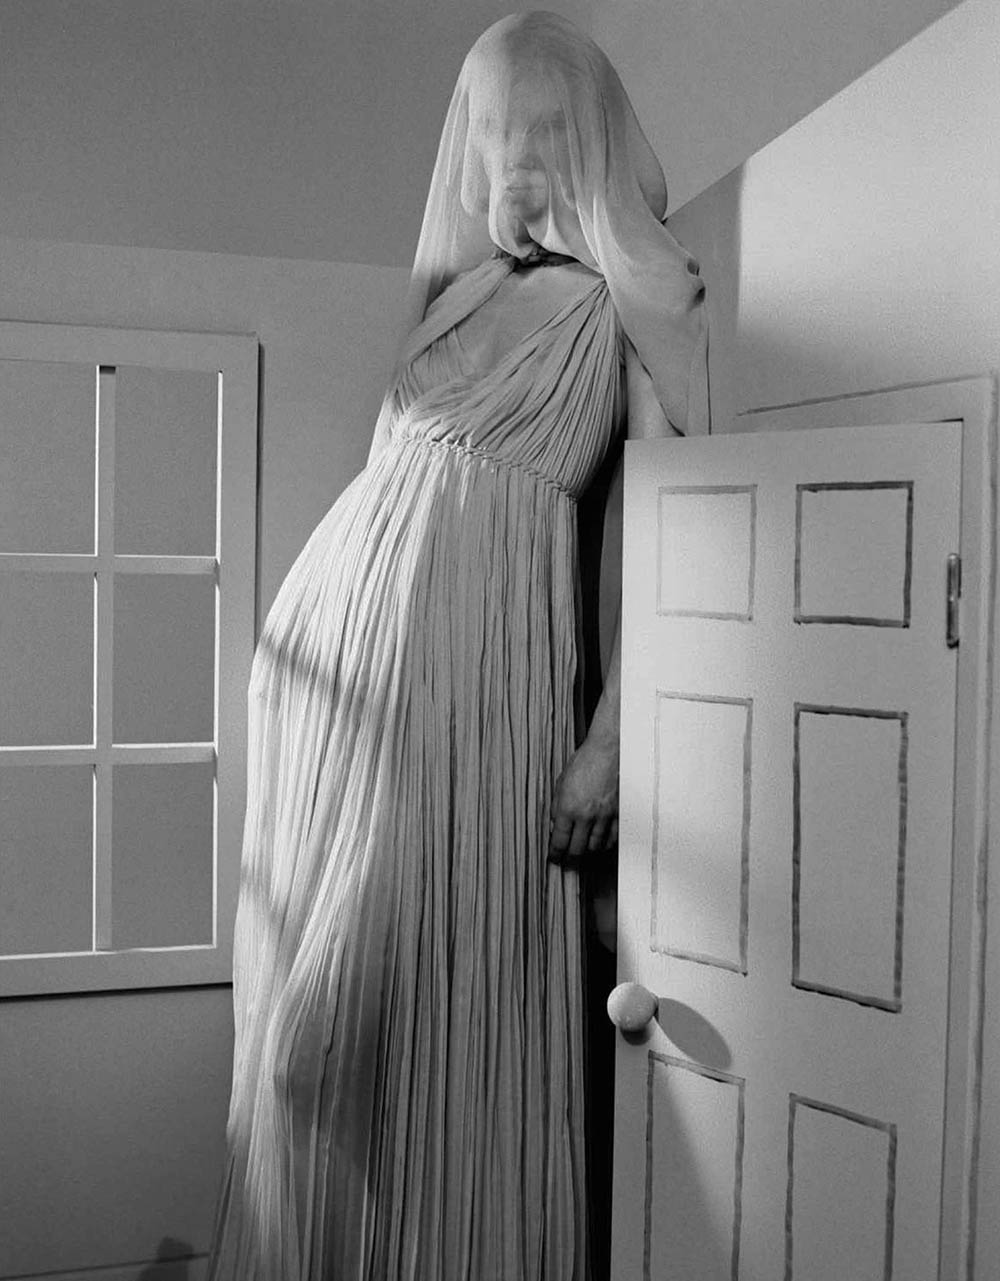 Vilma Sjöberg by Estelle Hanania for Vogue China April 2020